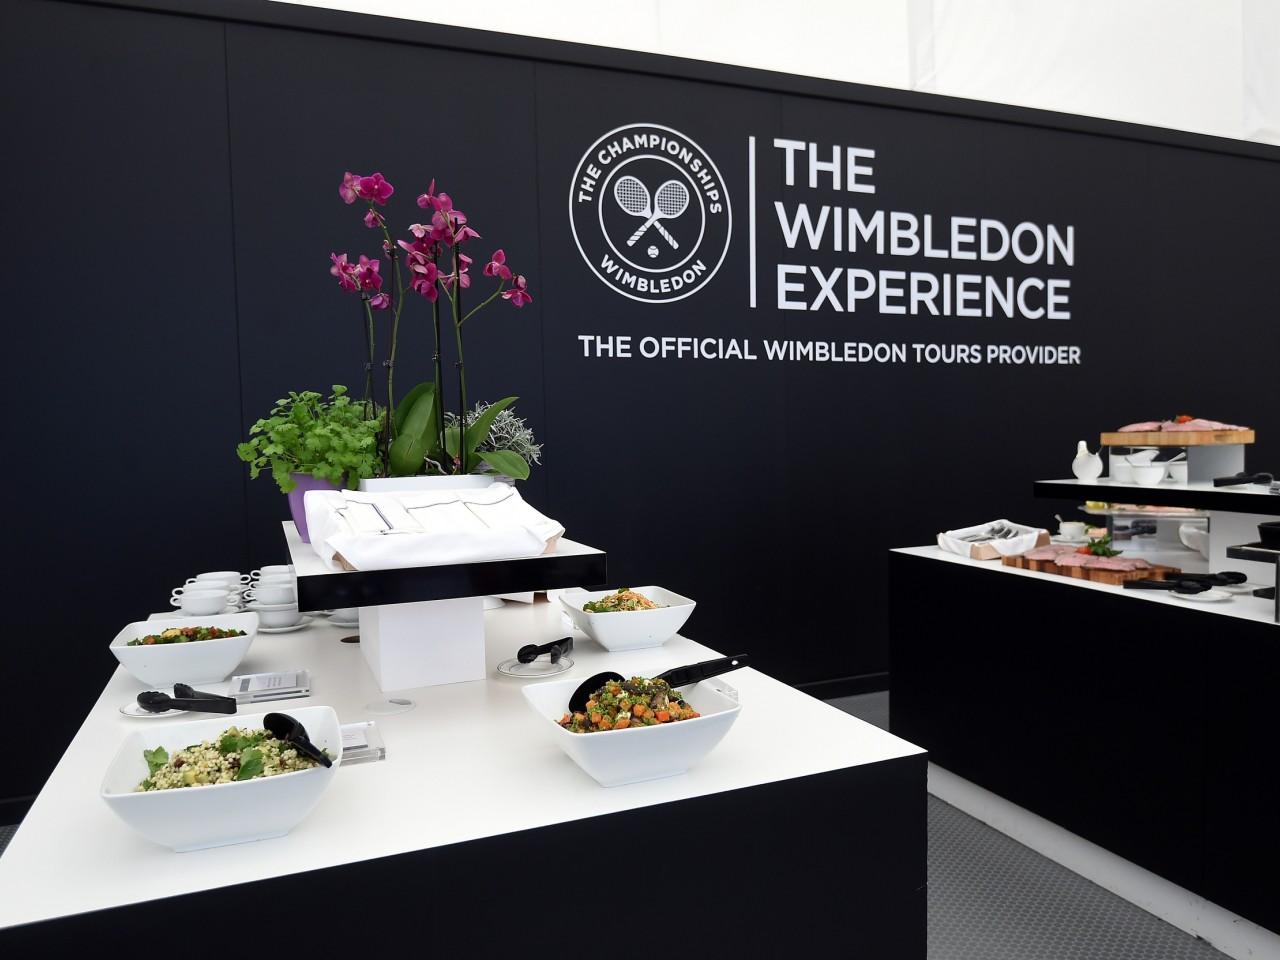 The Wimbledon Baseline Programme